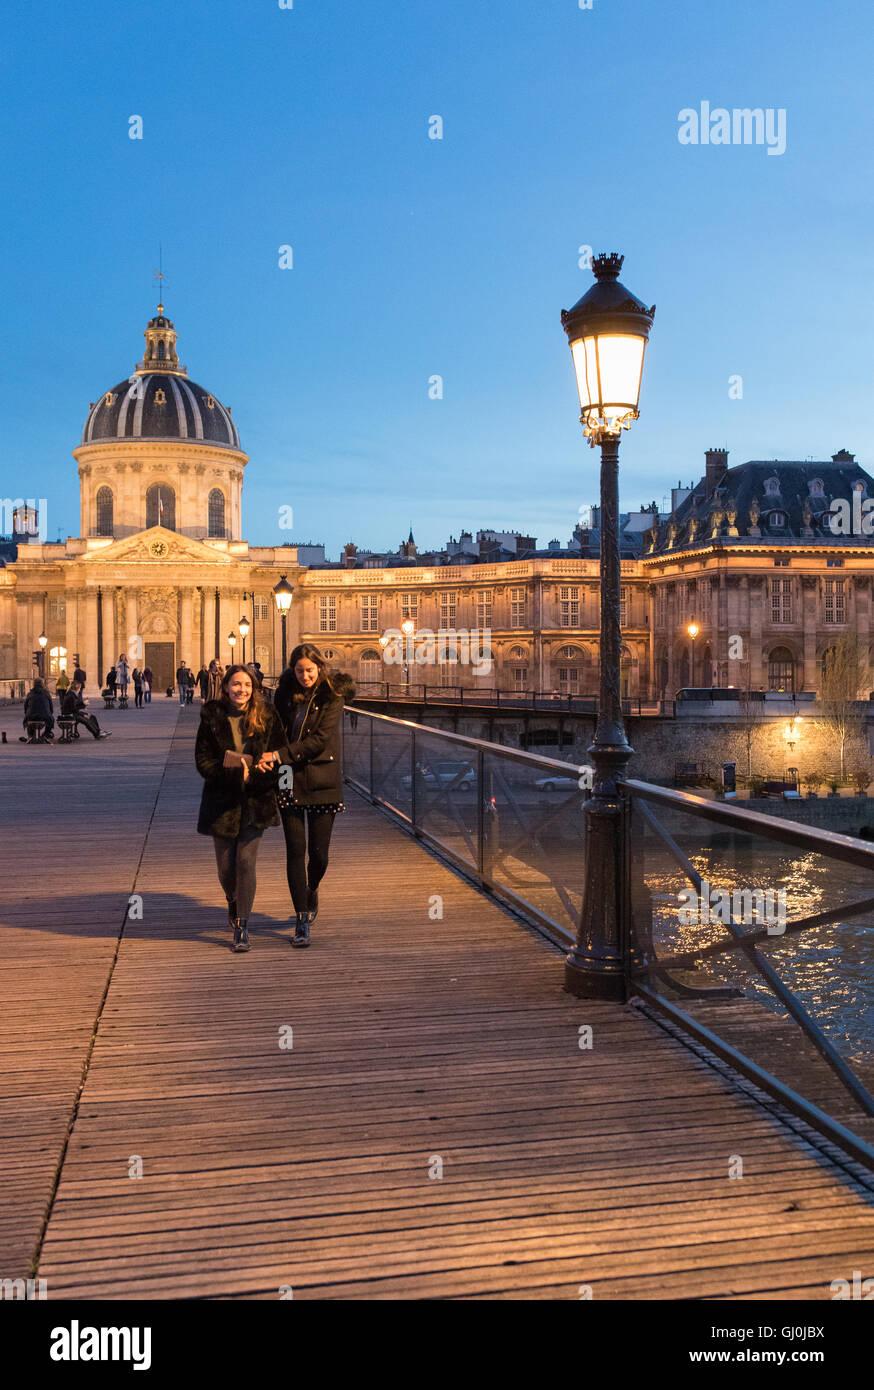 Figures on Pont des Arts at dusk, Paris, France - Stock Image